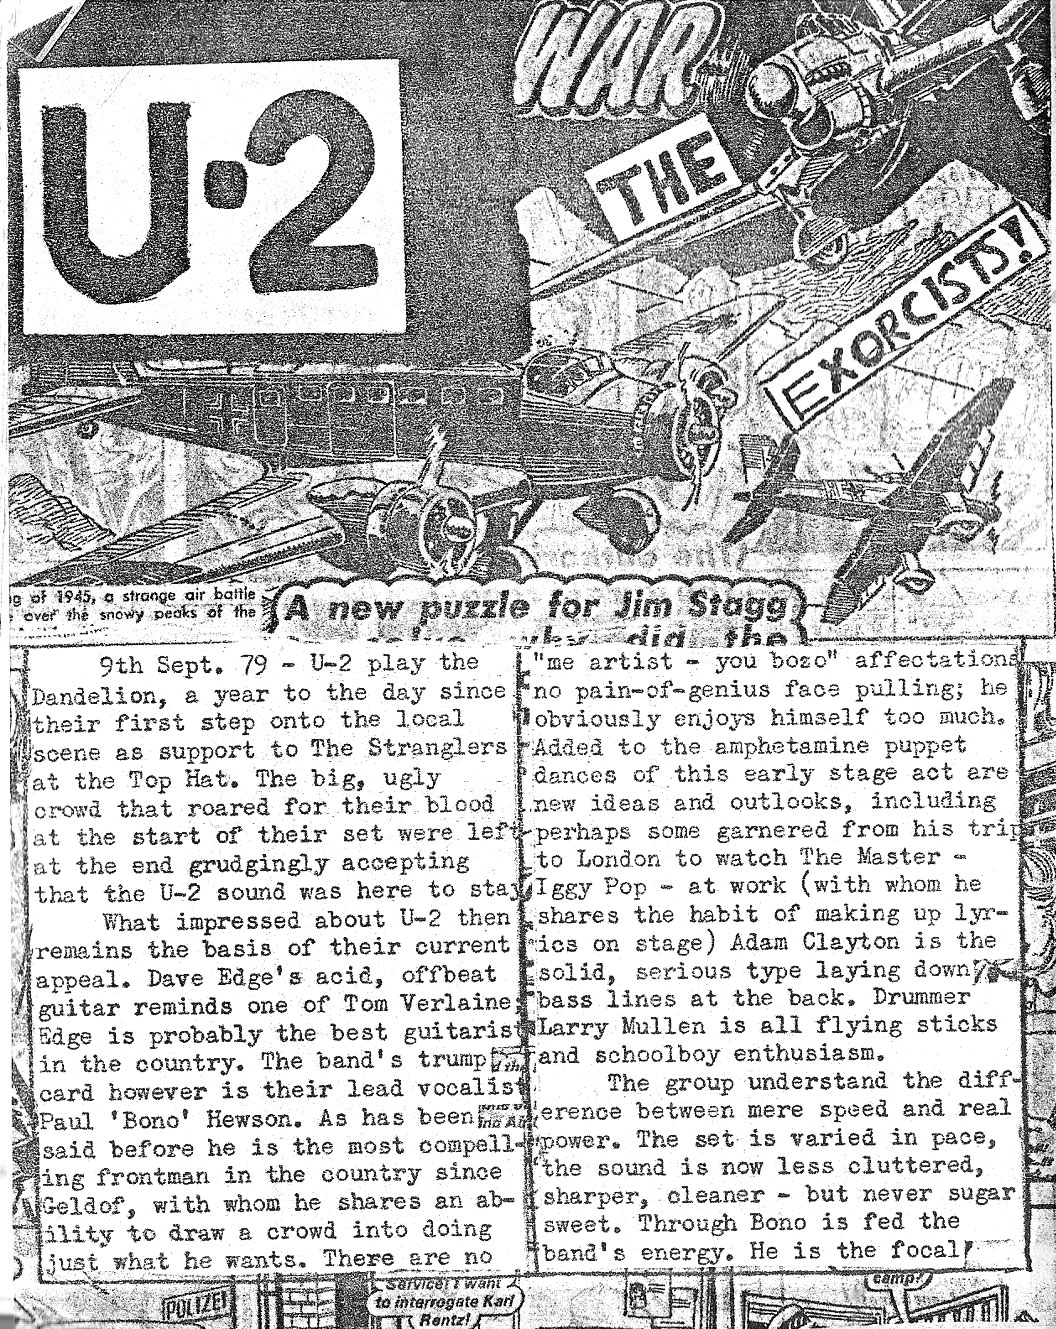 imprint-6-p1 u2 1979 interview